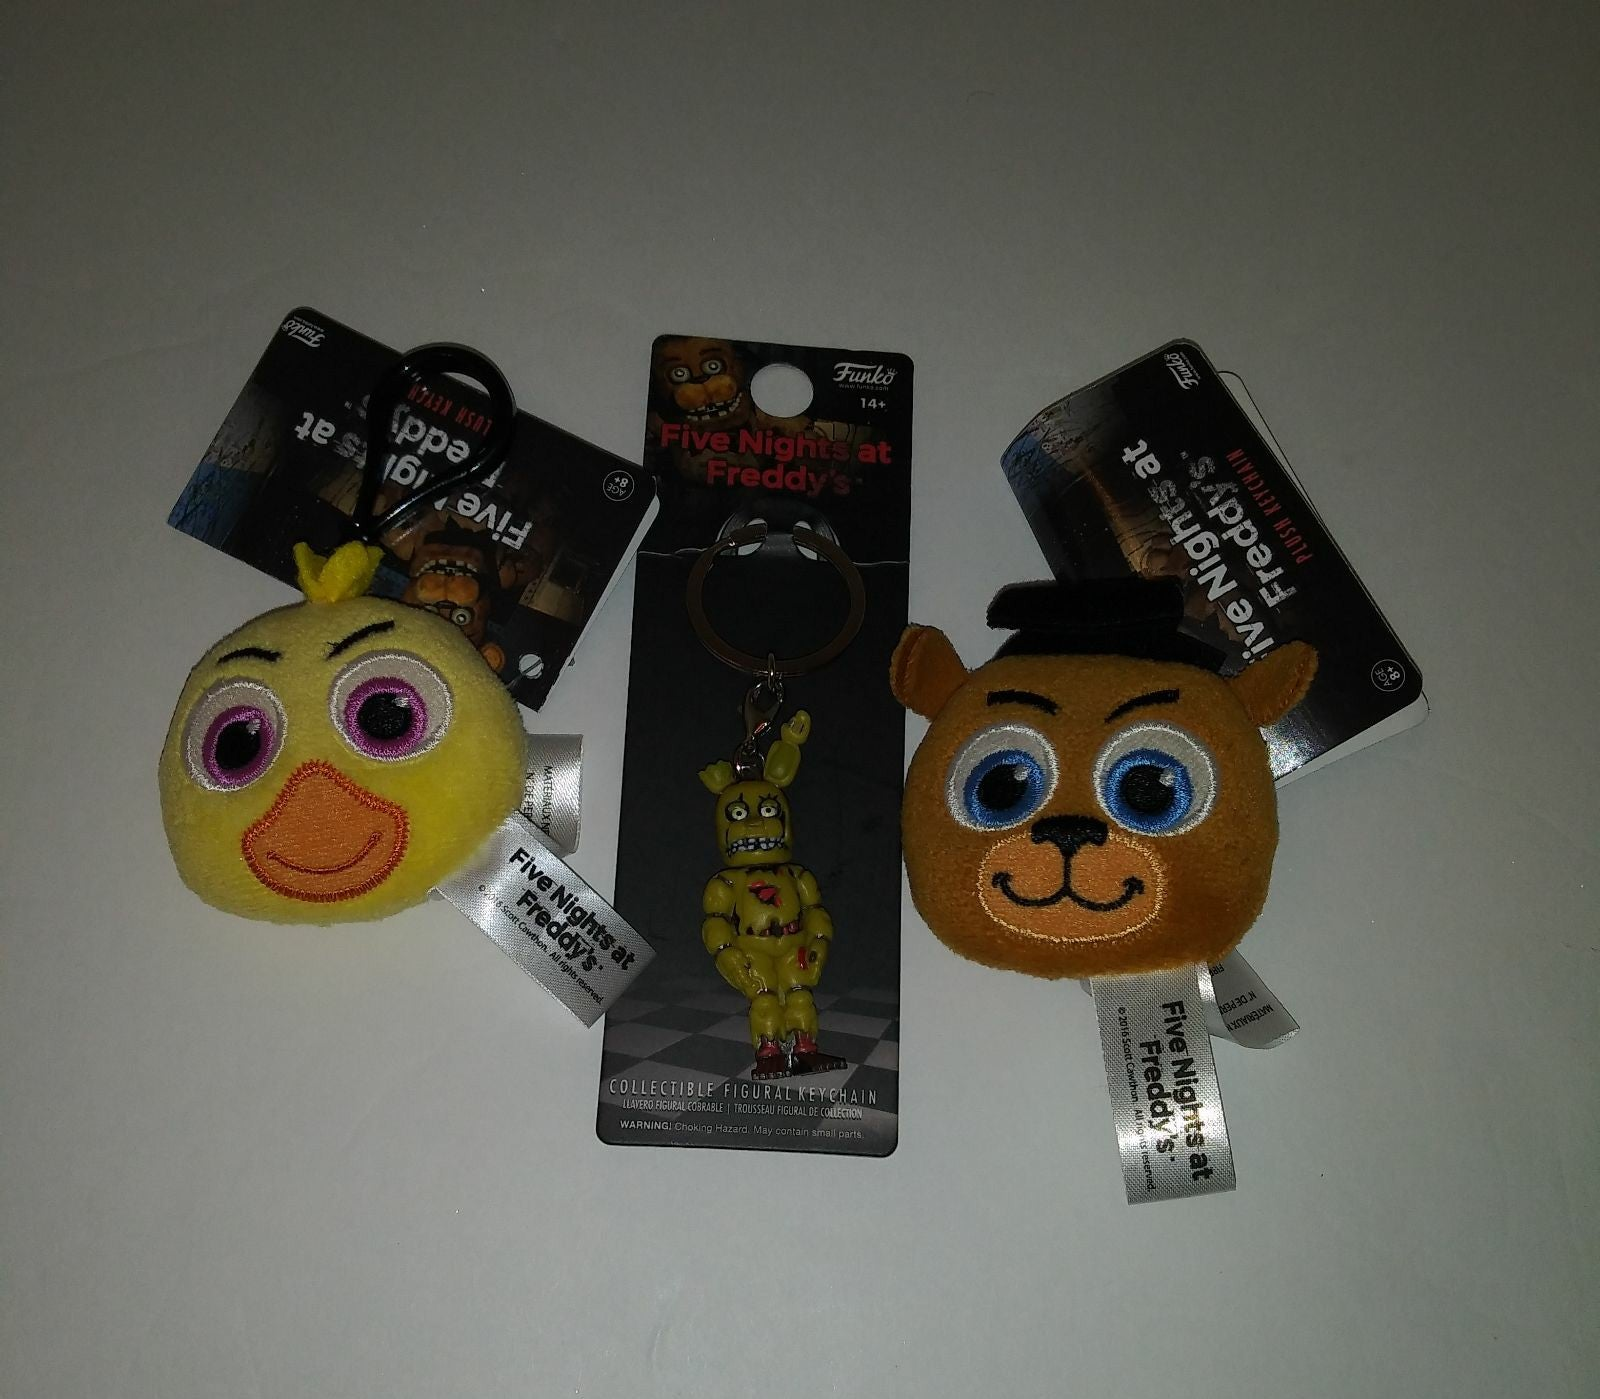 Five Nights at Freddy's Funko Keychains